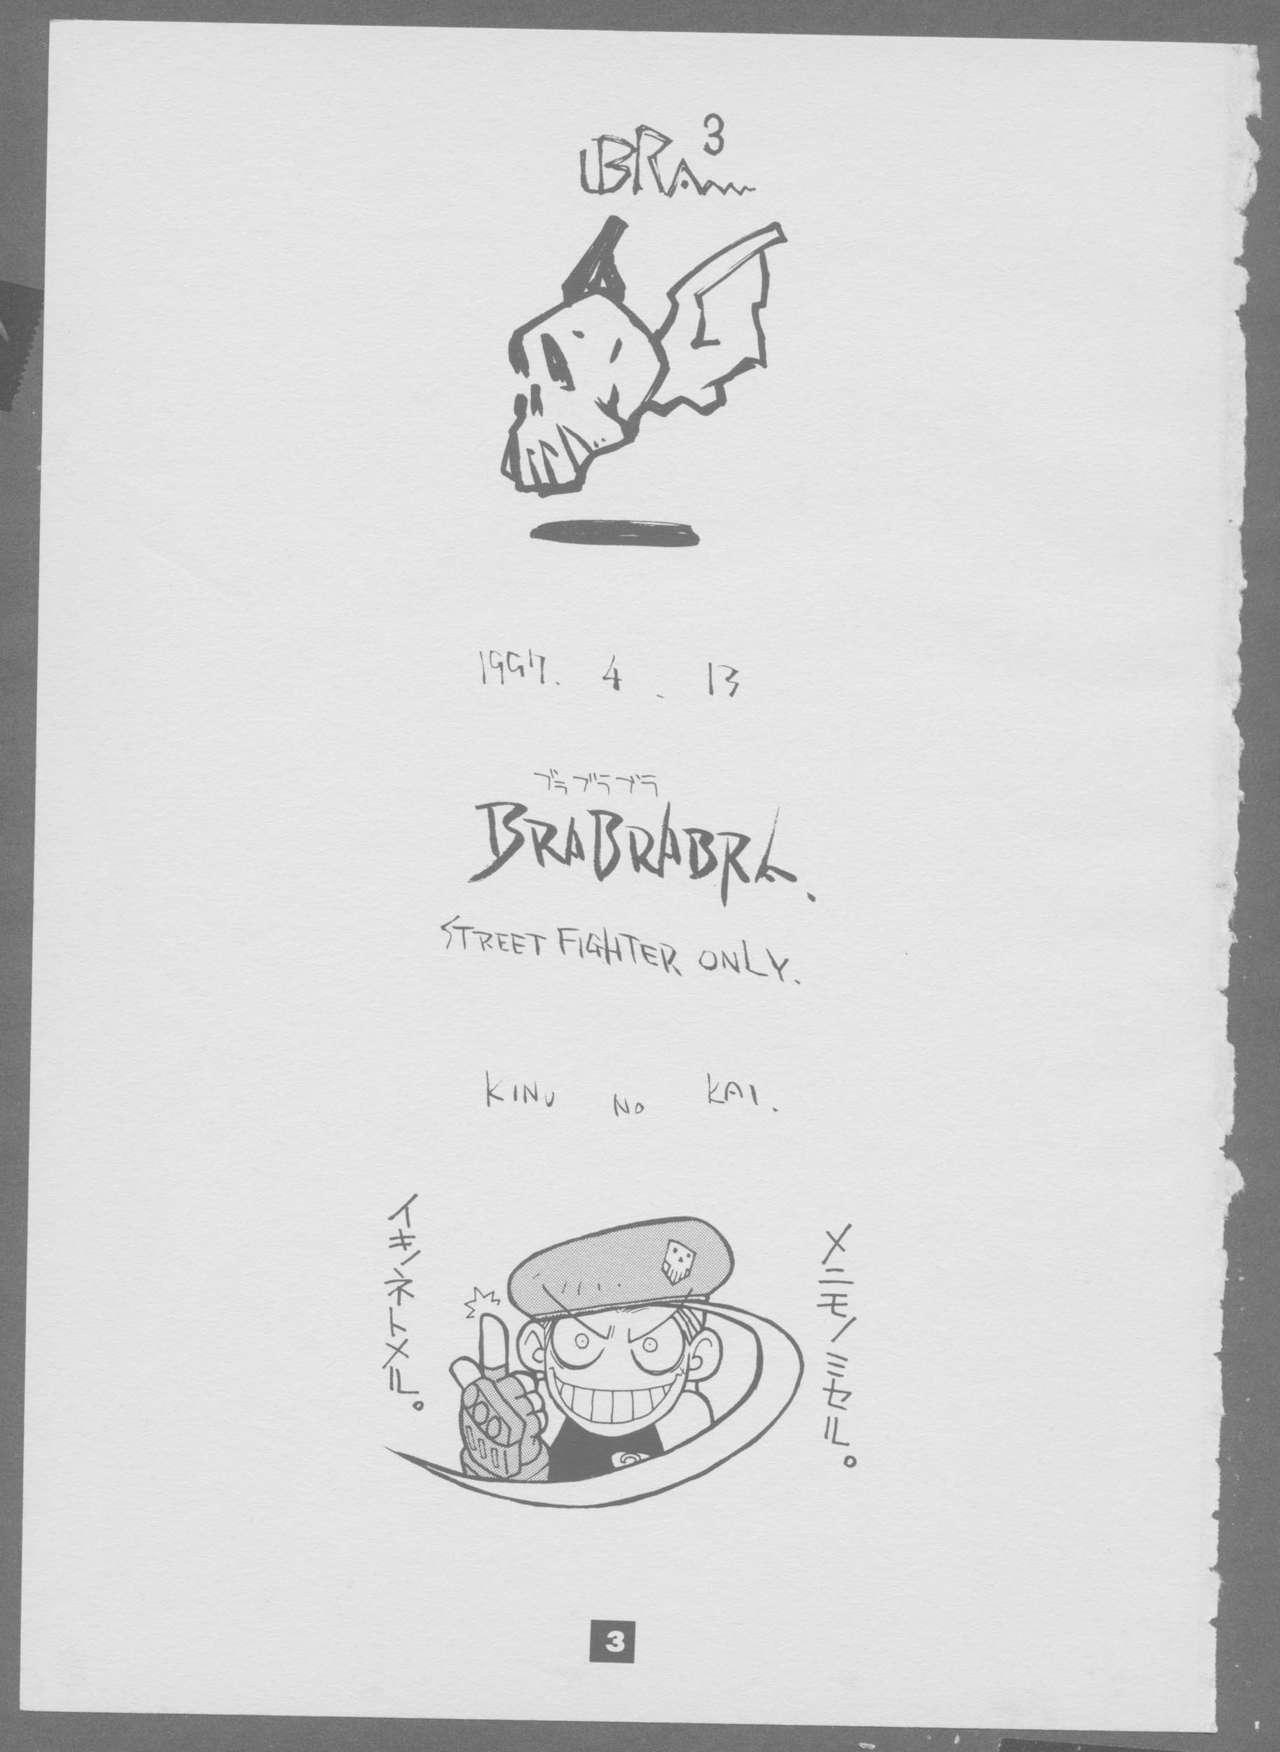 BraBraBra 1